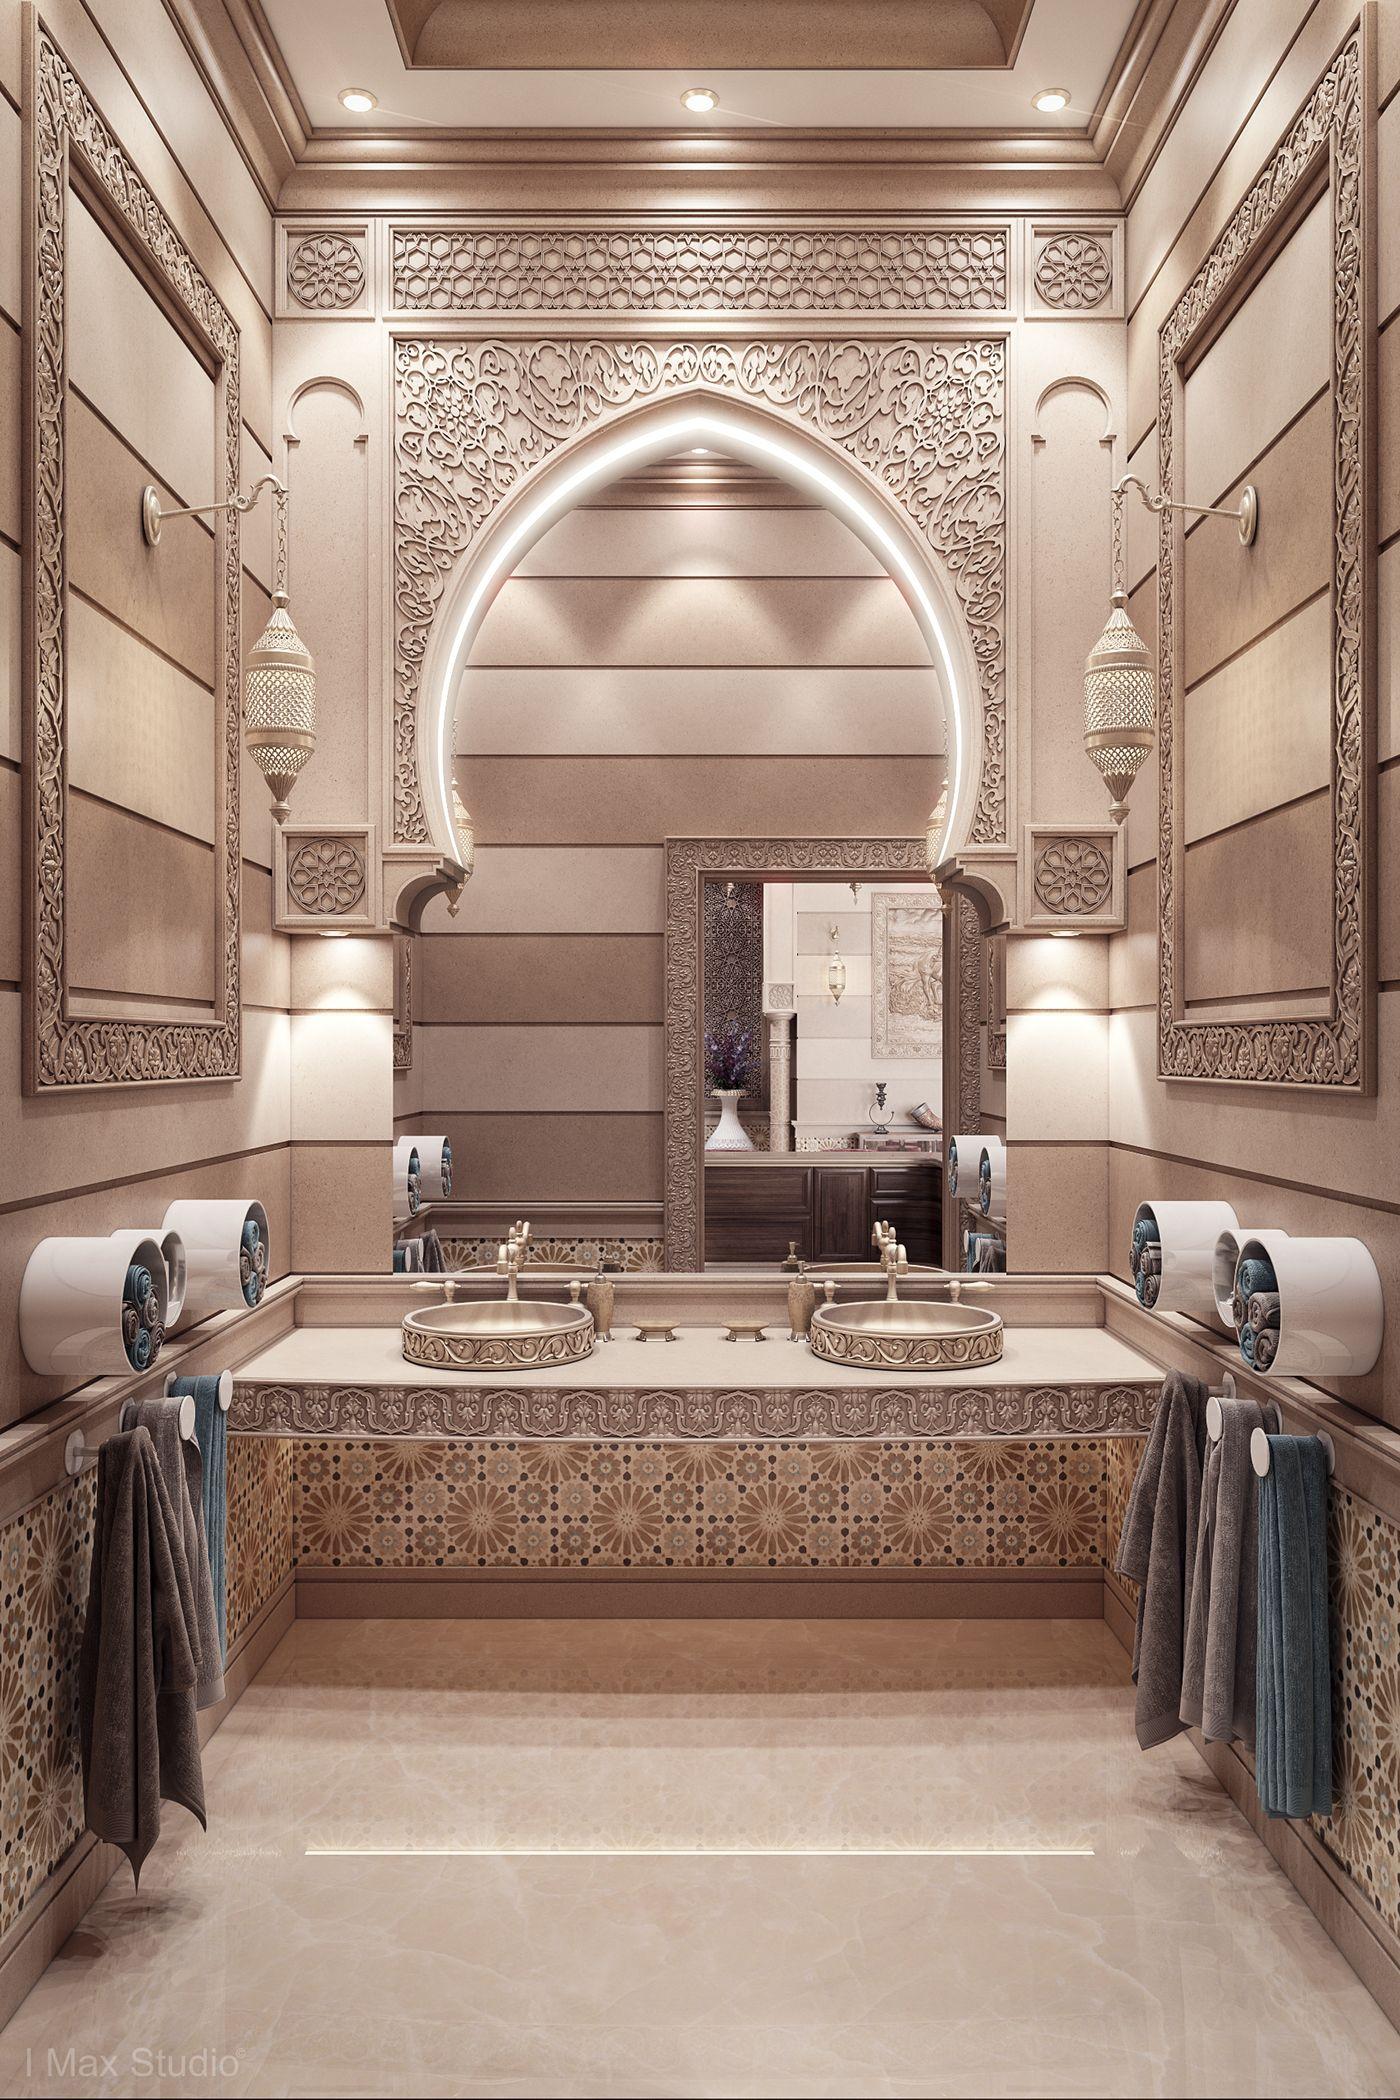 Best Kitchen Gallery: سحر الشرق Magic Of Orient On Behance Bathrooms Pinterest of Magic Themed Bathroom on rachelxblog.com